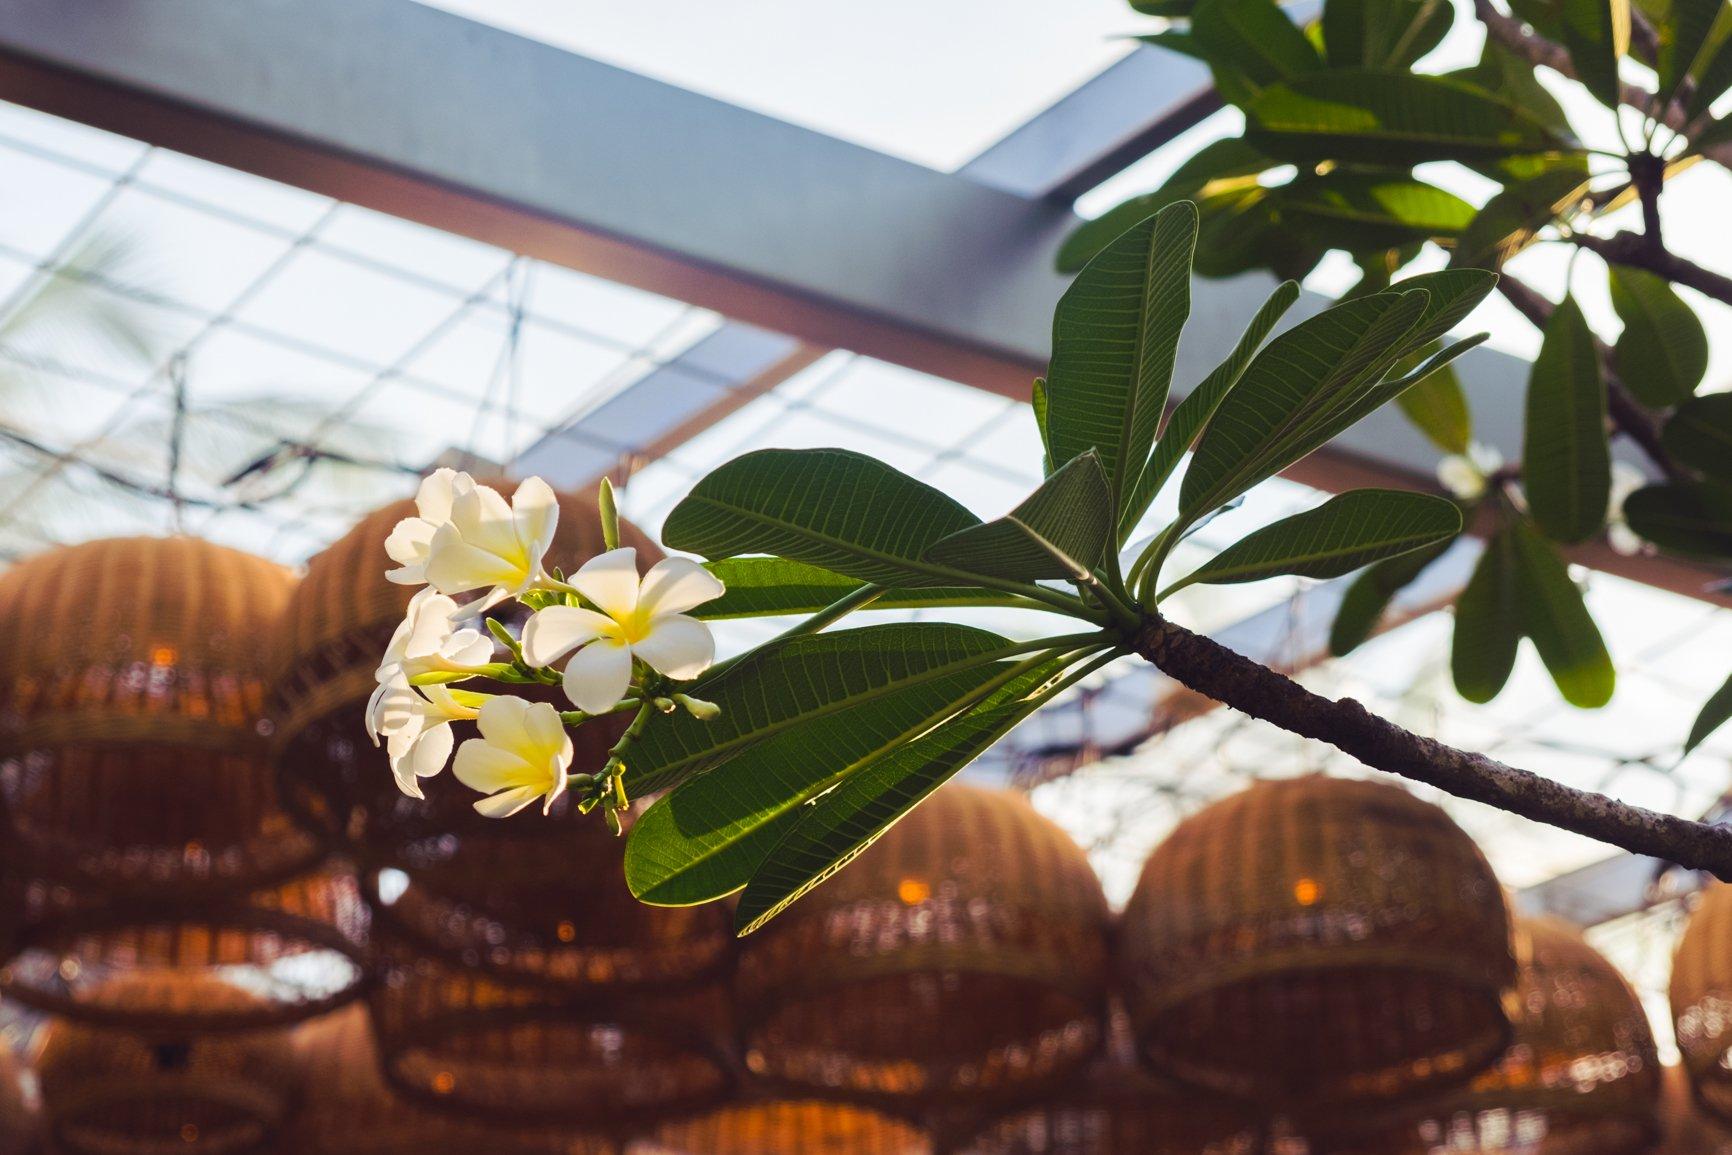 sunkissedblush-sunkissedblush-Elemis-Frangipani-Monoi-Salt-Glow-Scrub-Frangipani-flower (1 of 1)